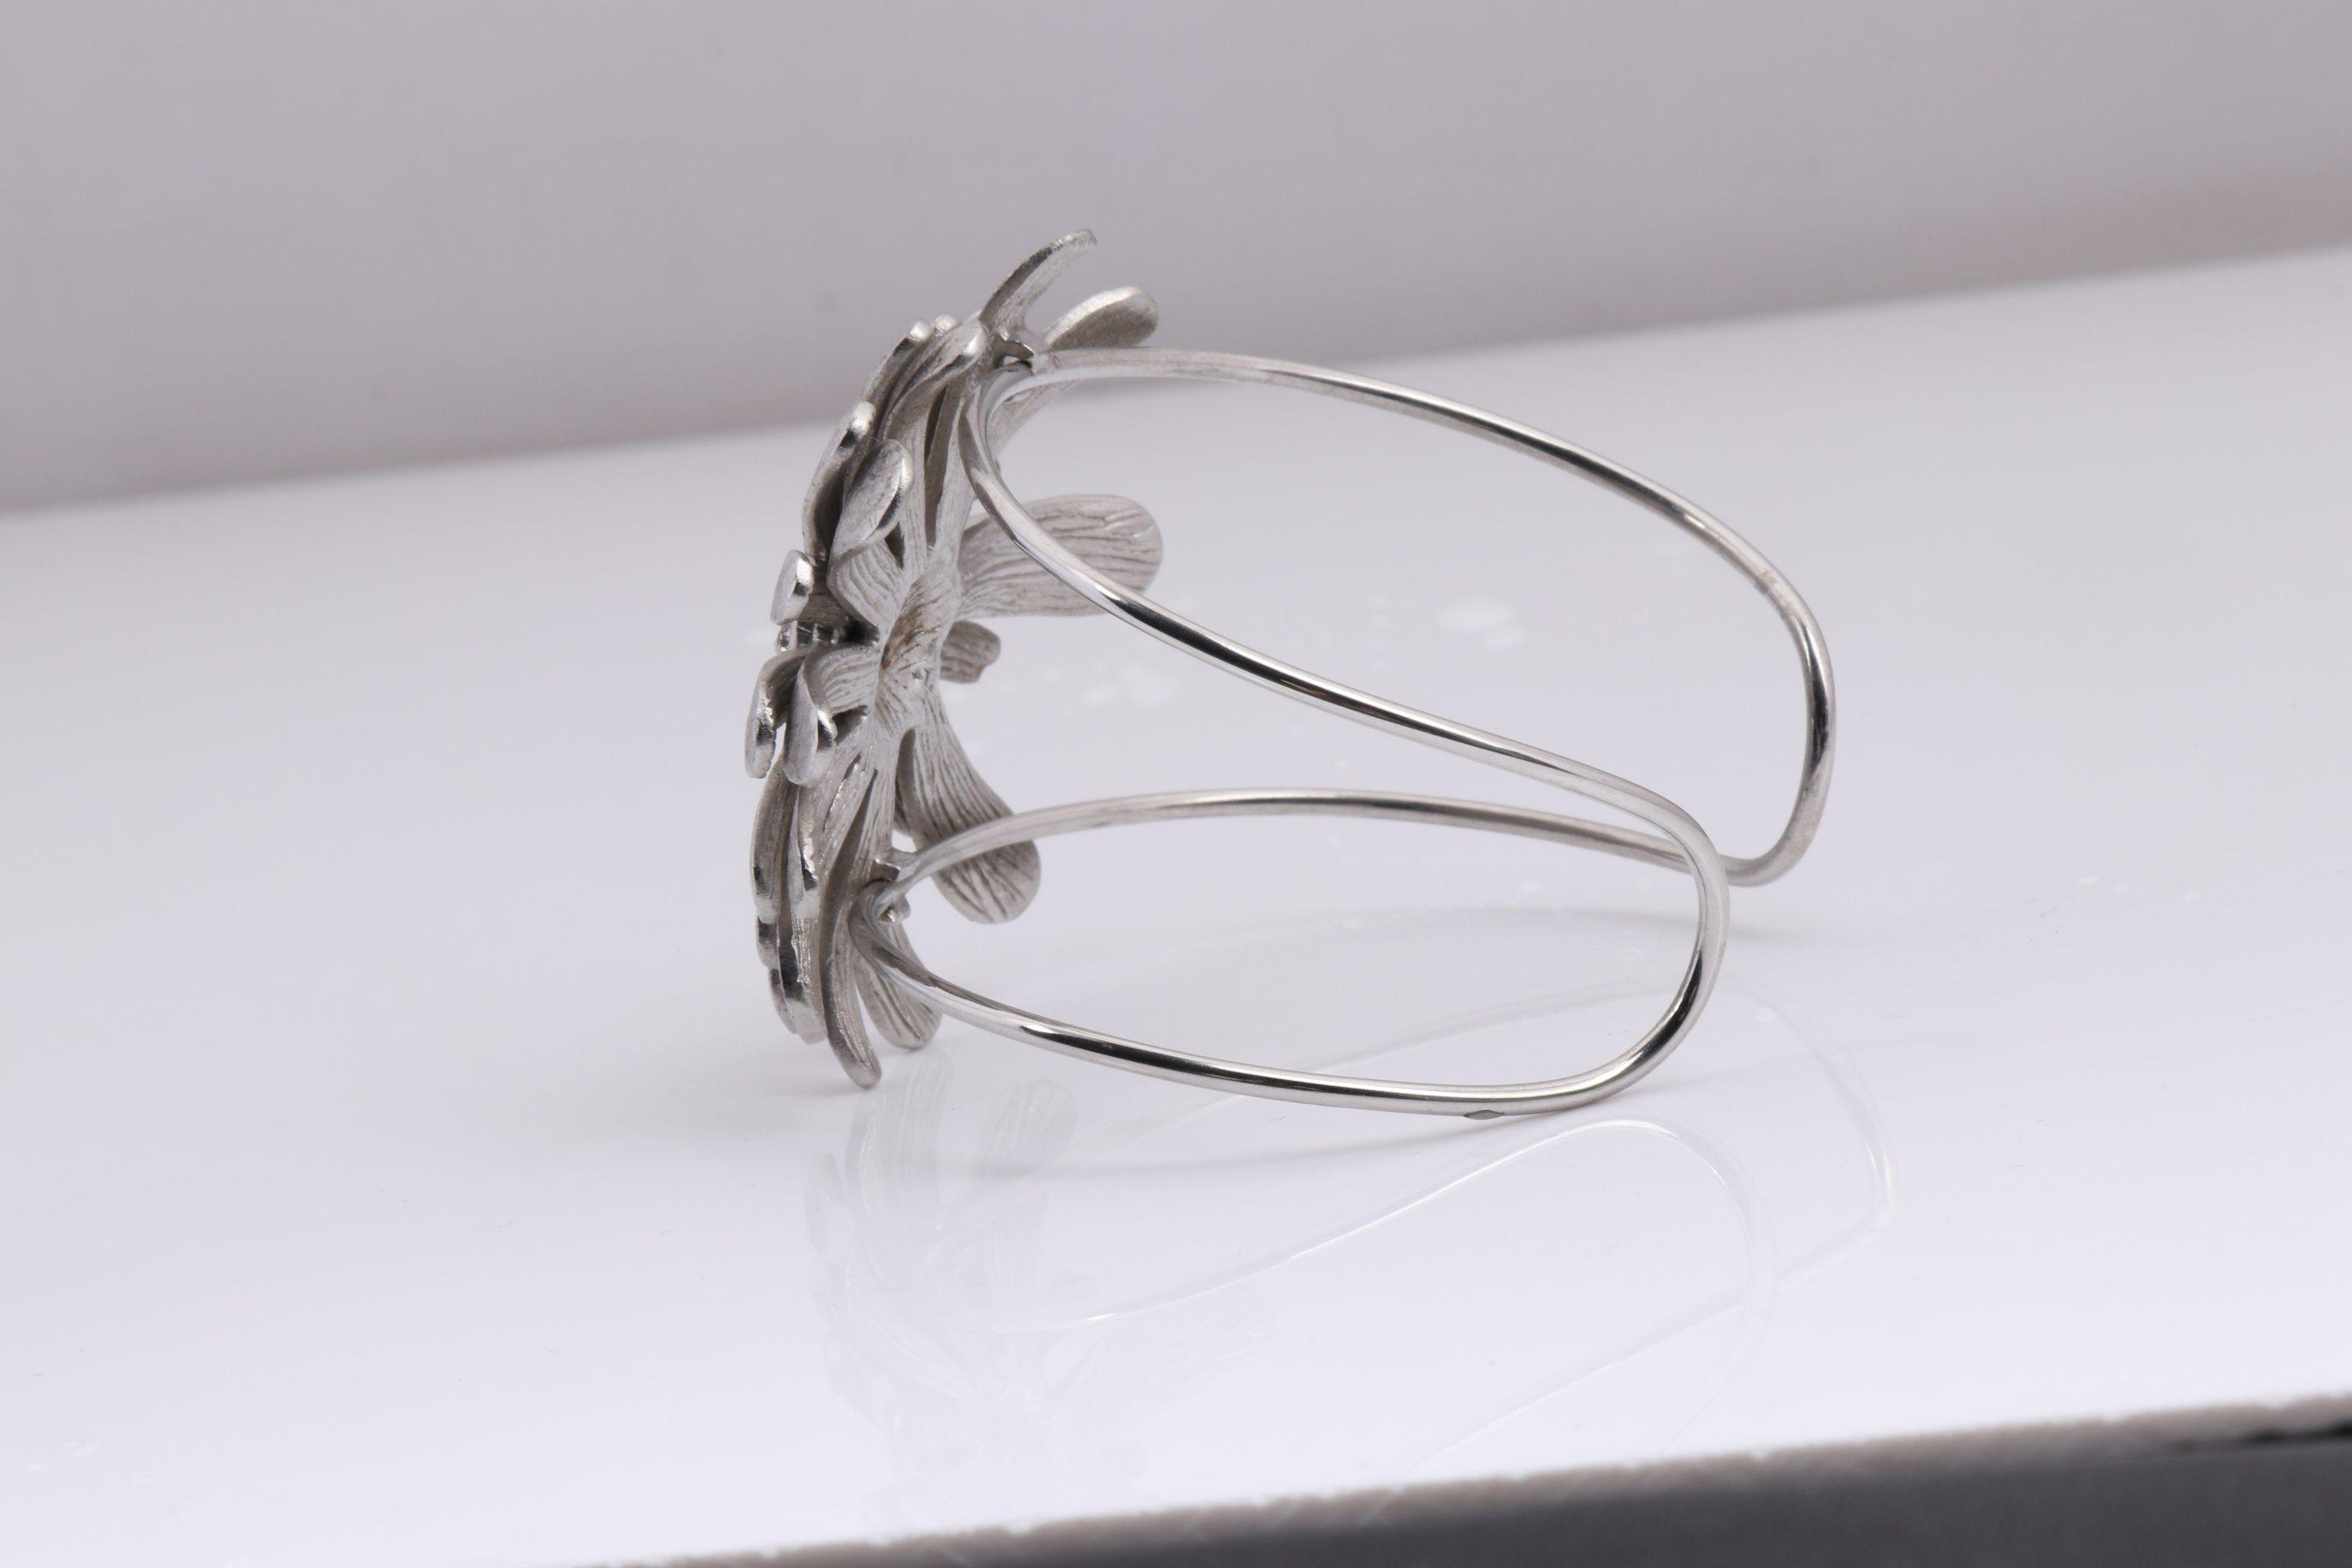 Stainless Steel Flower Bangle Jewelry Bracelet Wholesale for Women